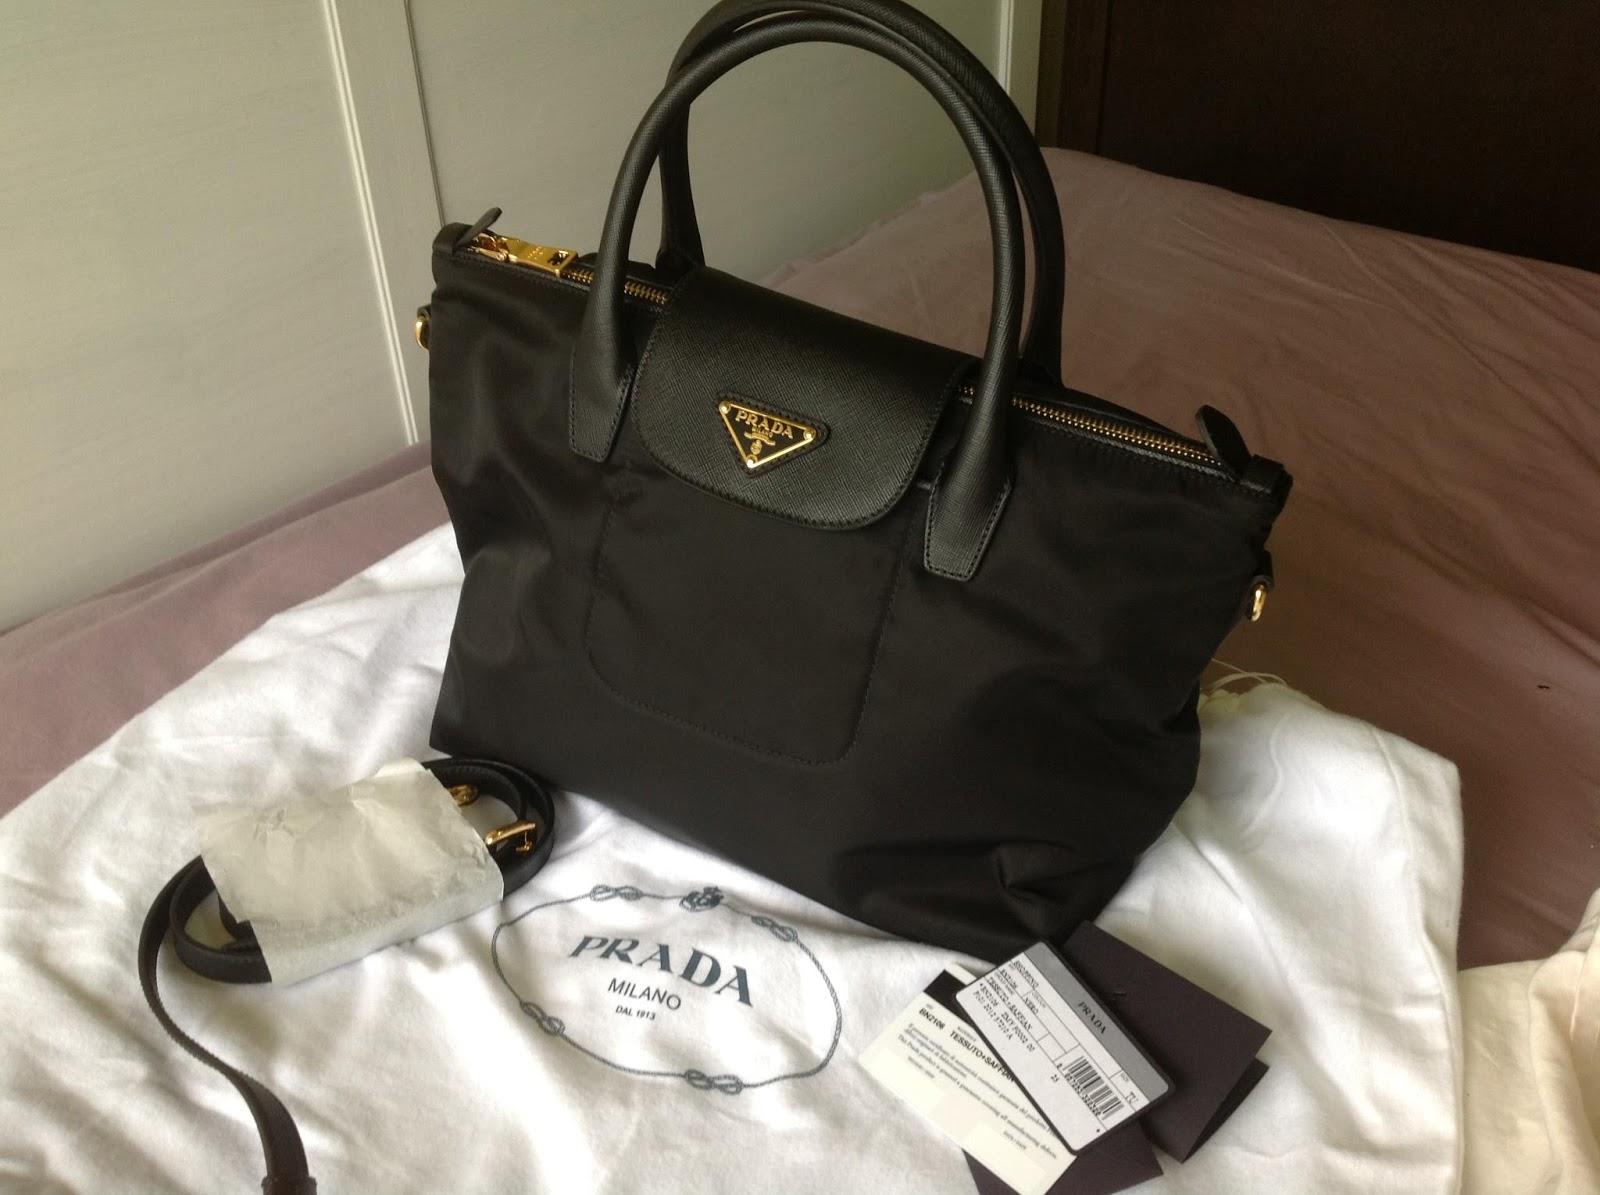 Iiloike Designer Bags Winter Prada Online Malaysia